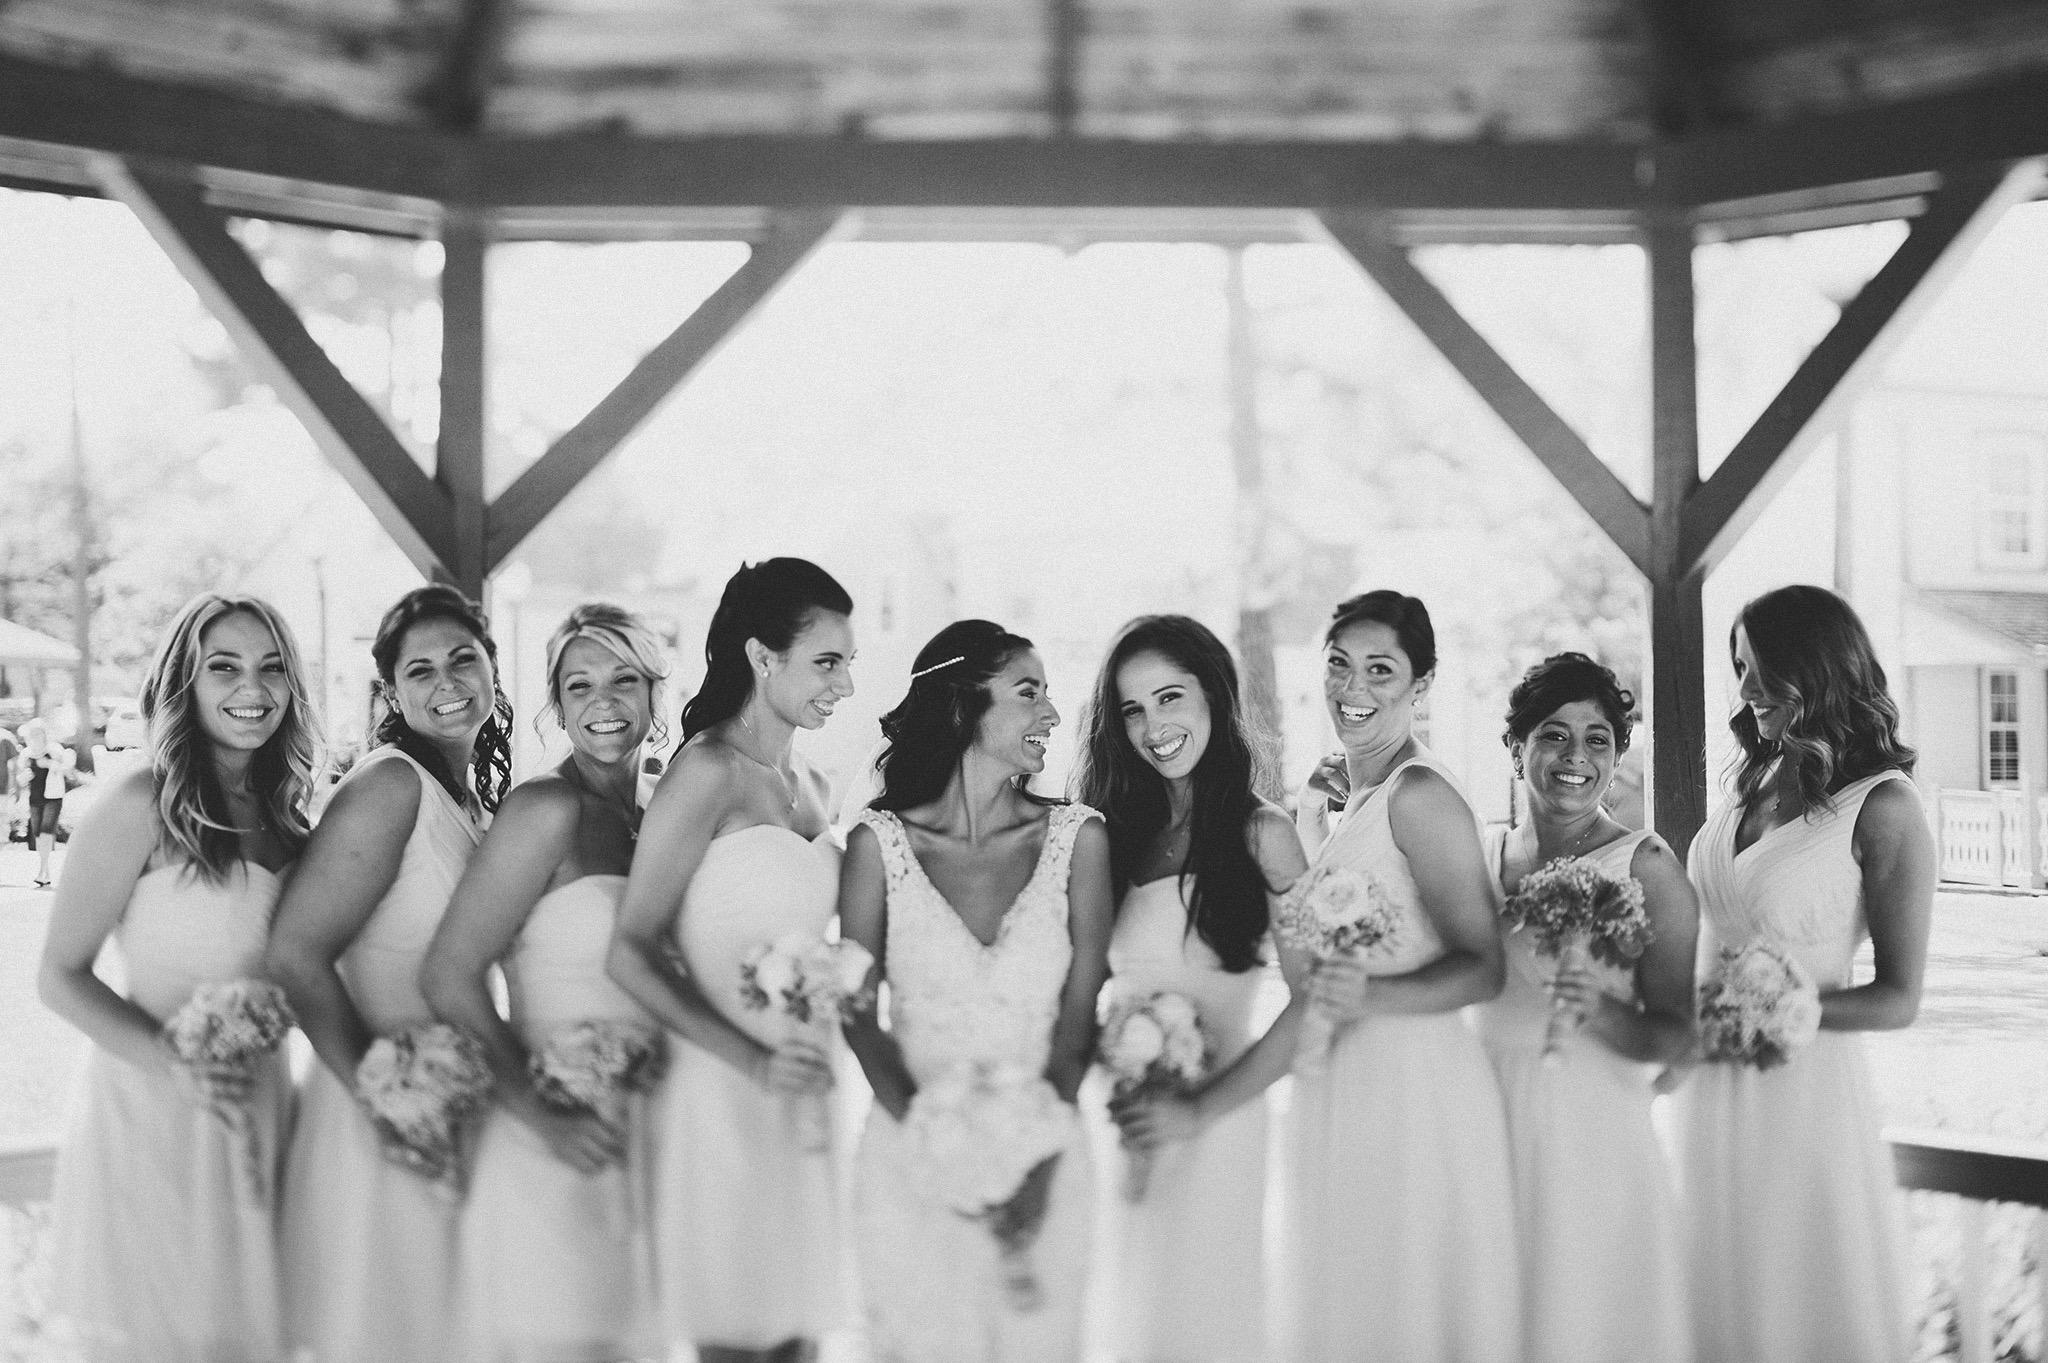 25-bridesmaids-at-smithville-inn.jpg